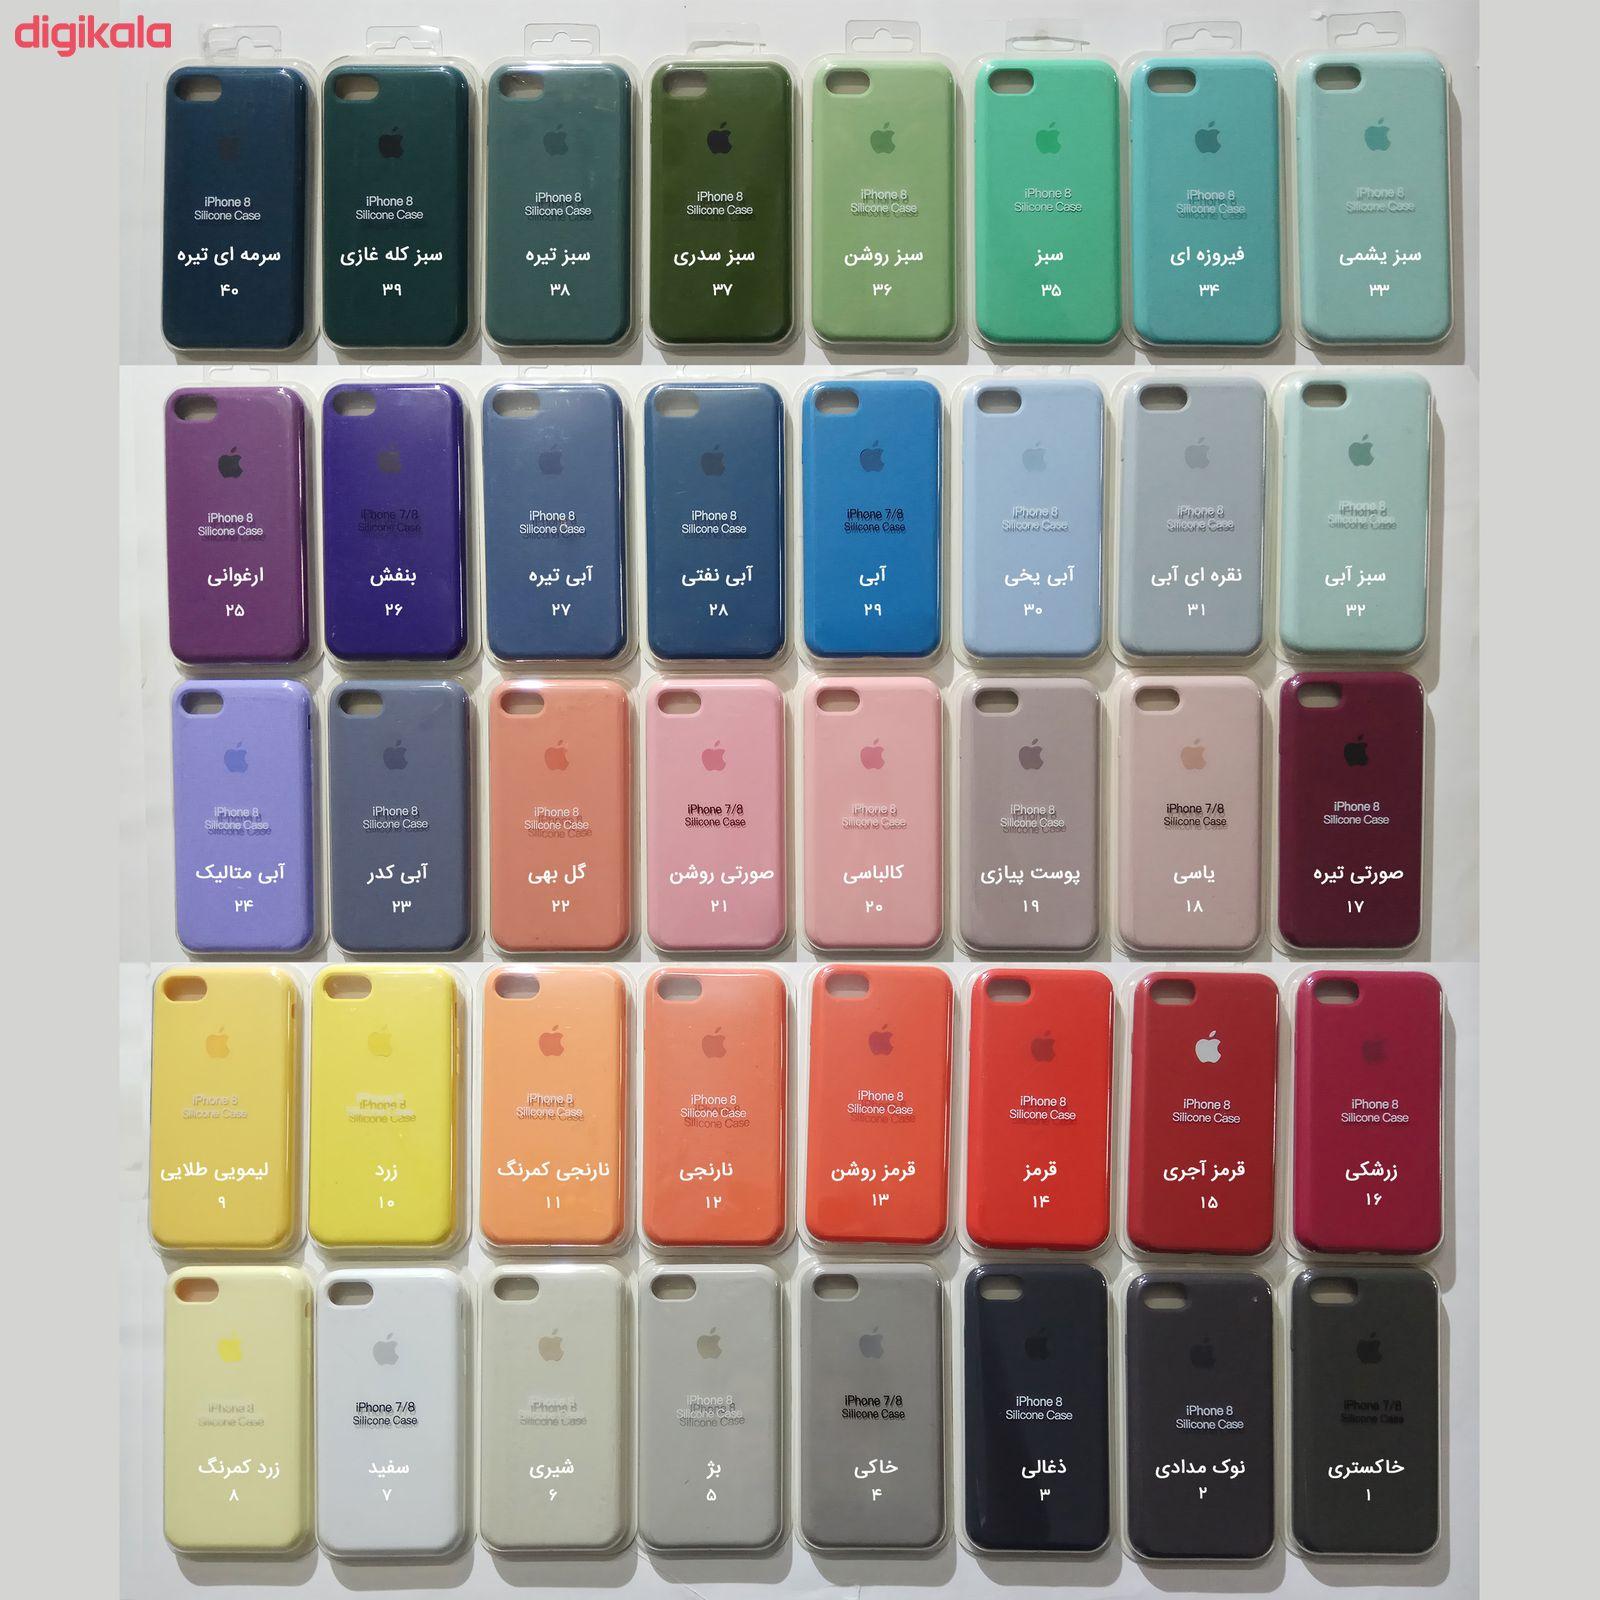 کاور وی کیس مدل Si01 مناسب برای گوشی موبایل اپل iPhone 11 Pro Max main 1 2